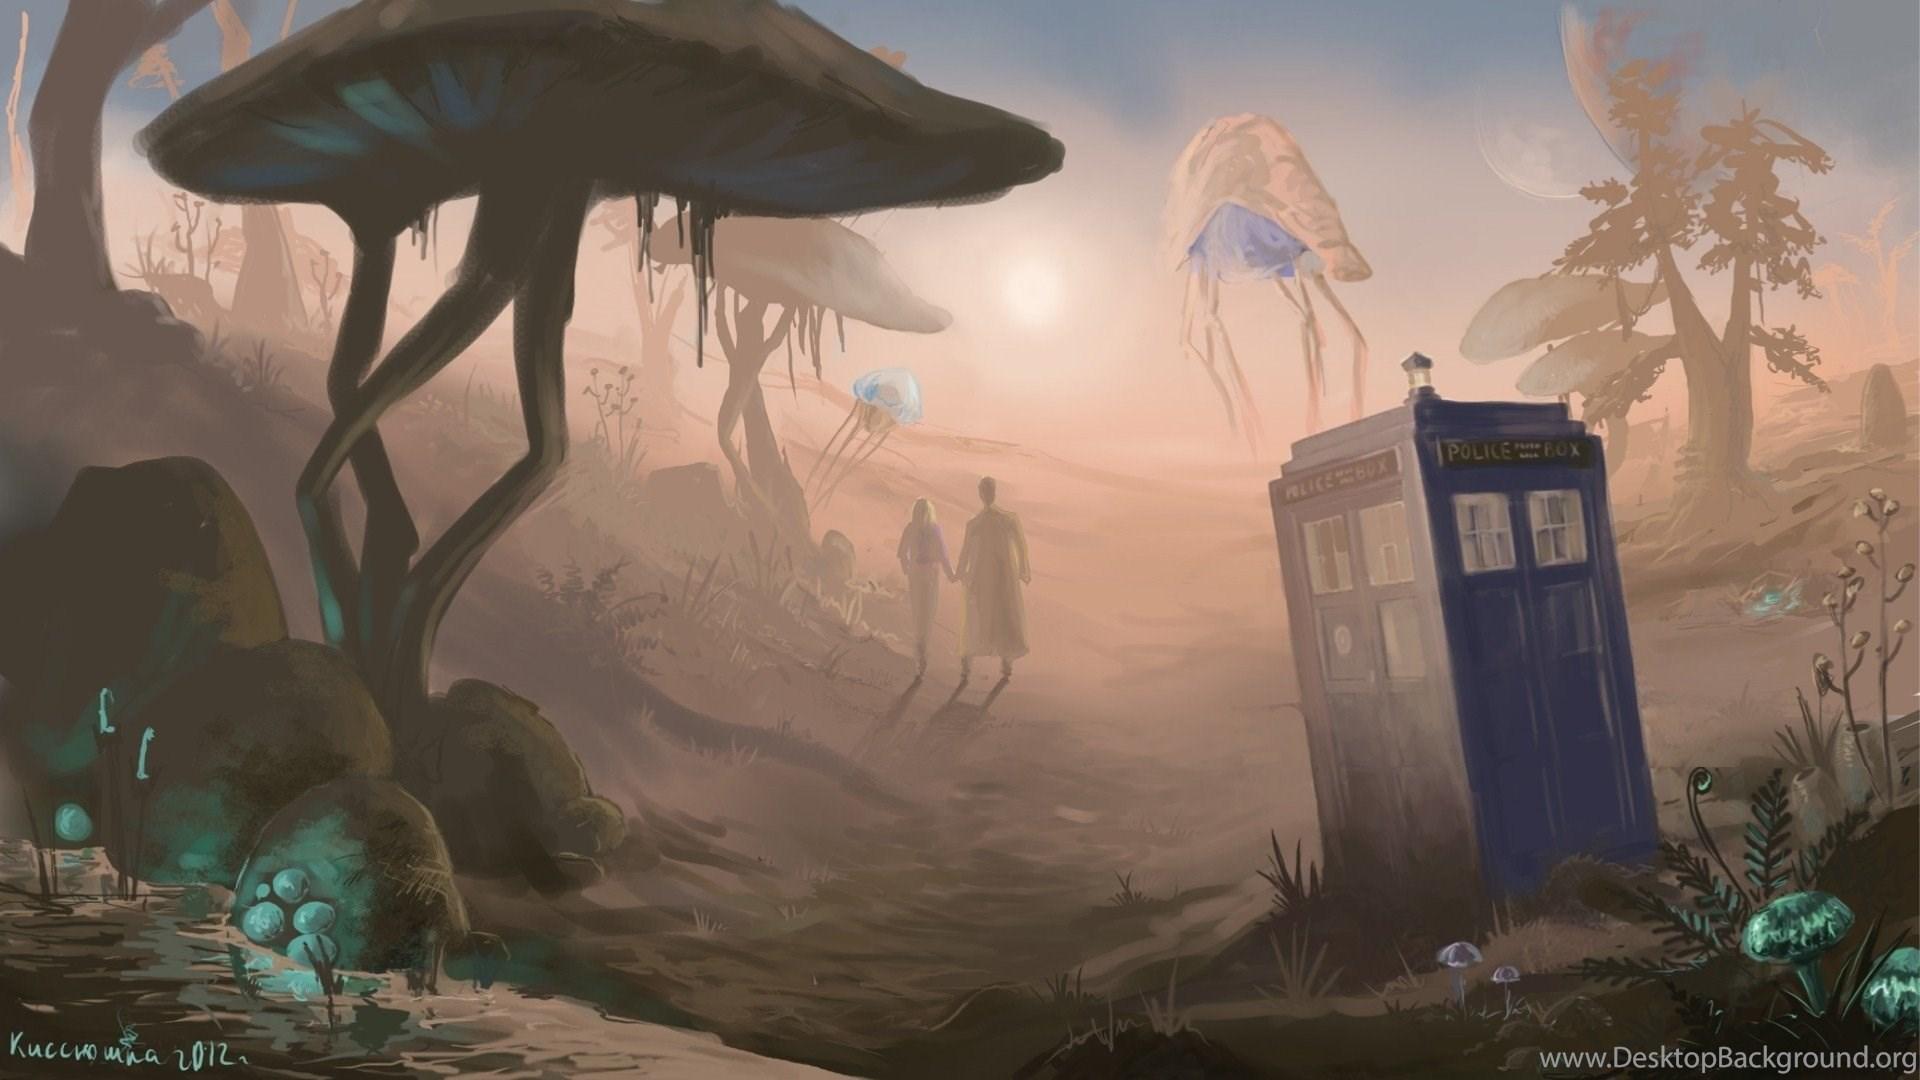 Doctor Who Morrowind Tardis Funny Eye 1920x1080 Hd Wallpapers